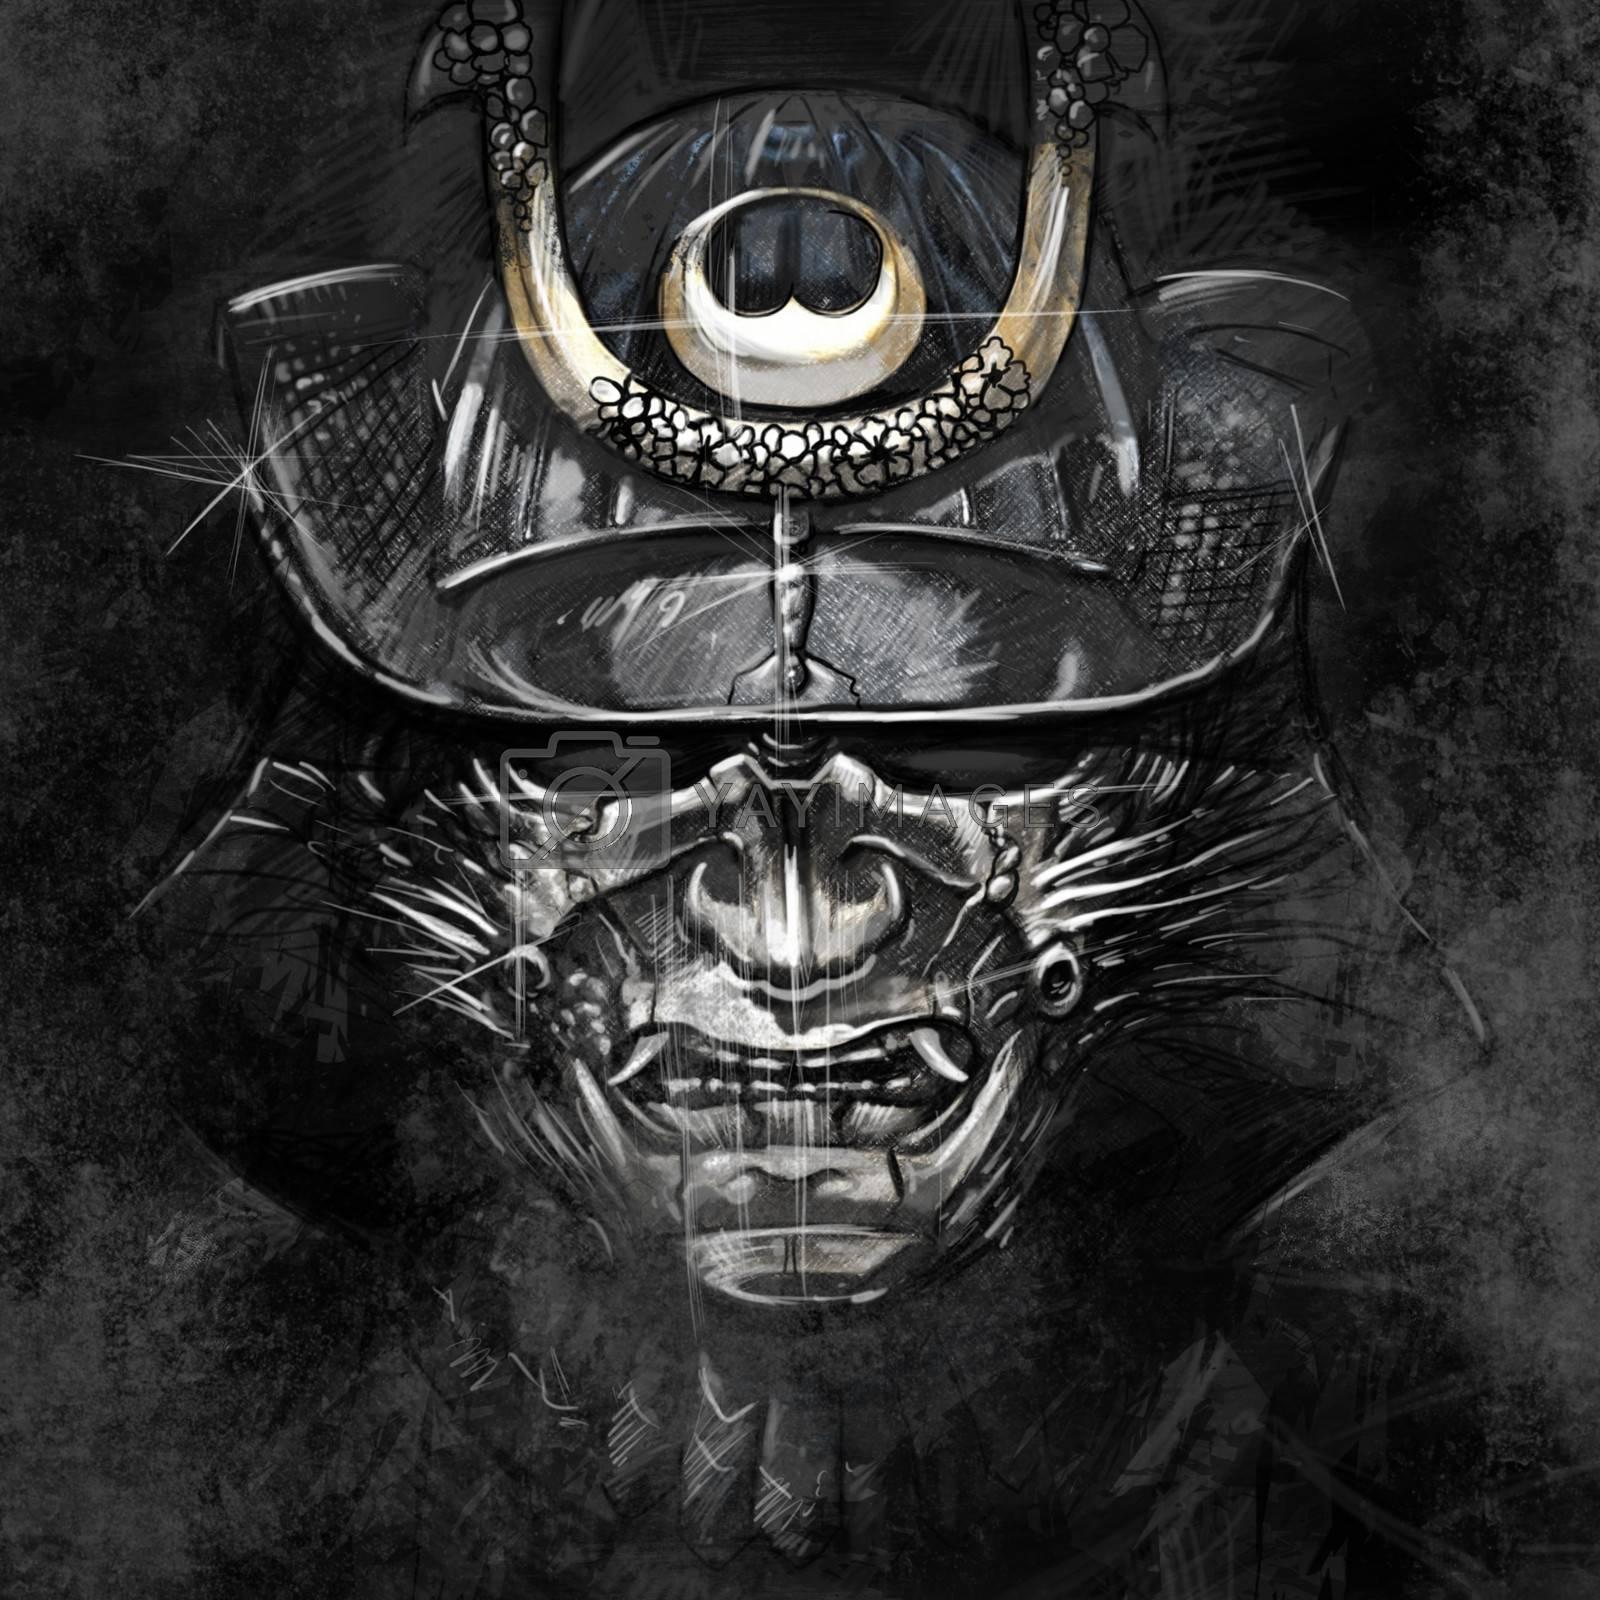 illustrations from a Japanese samurai warrior mask